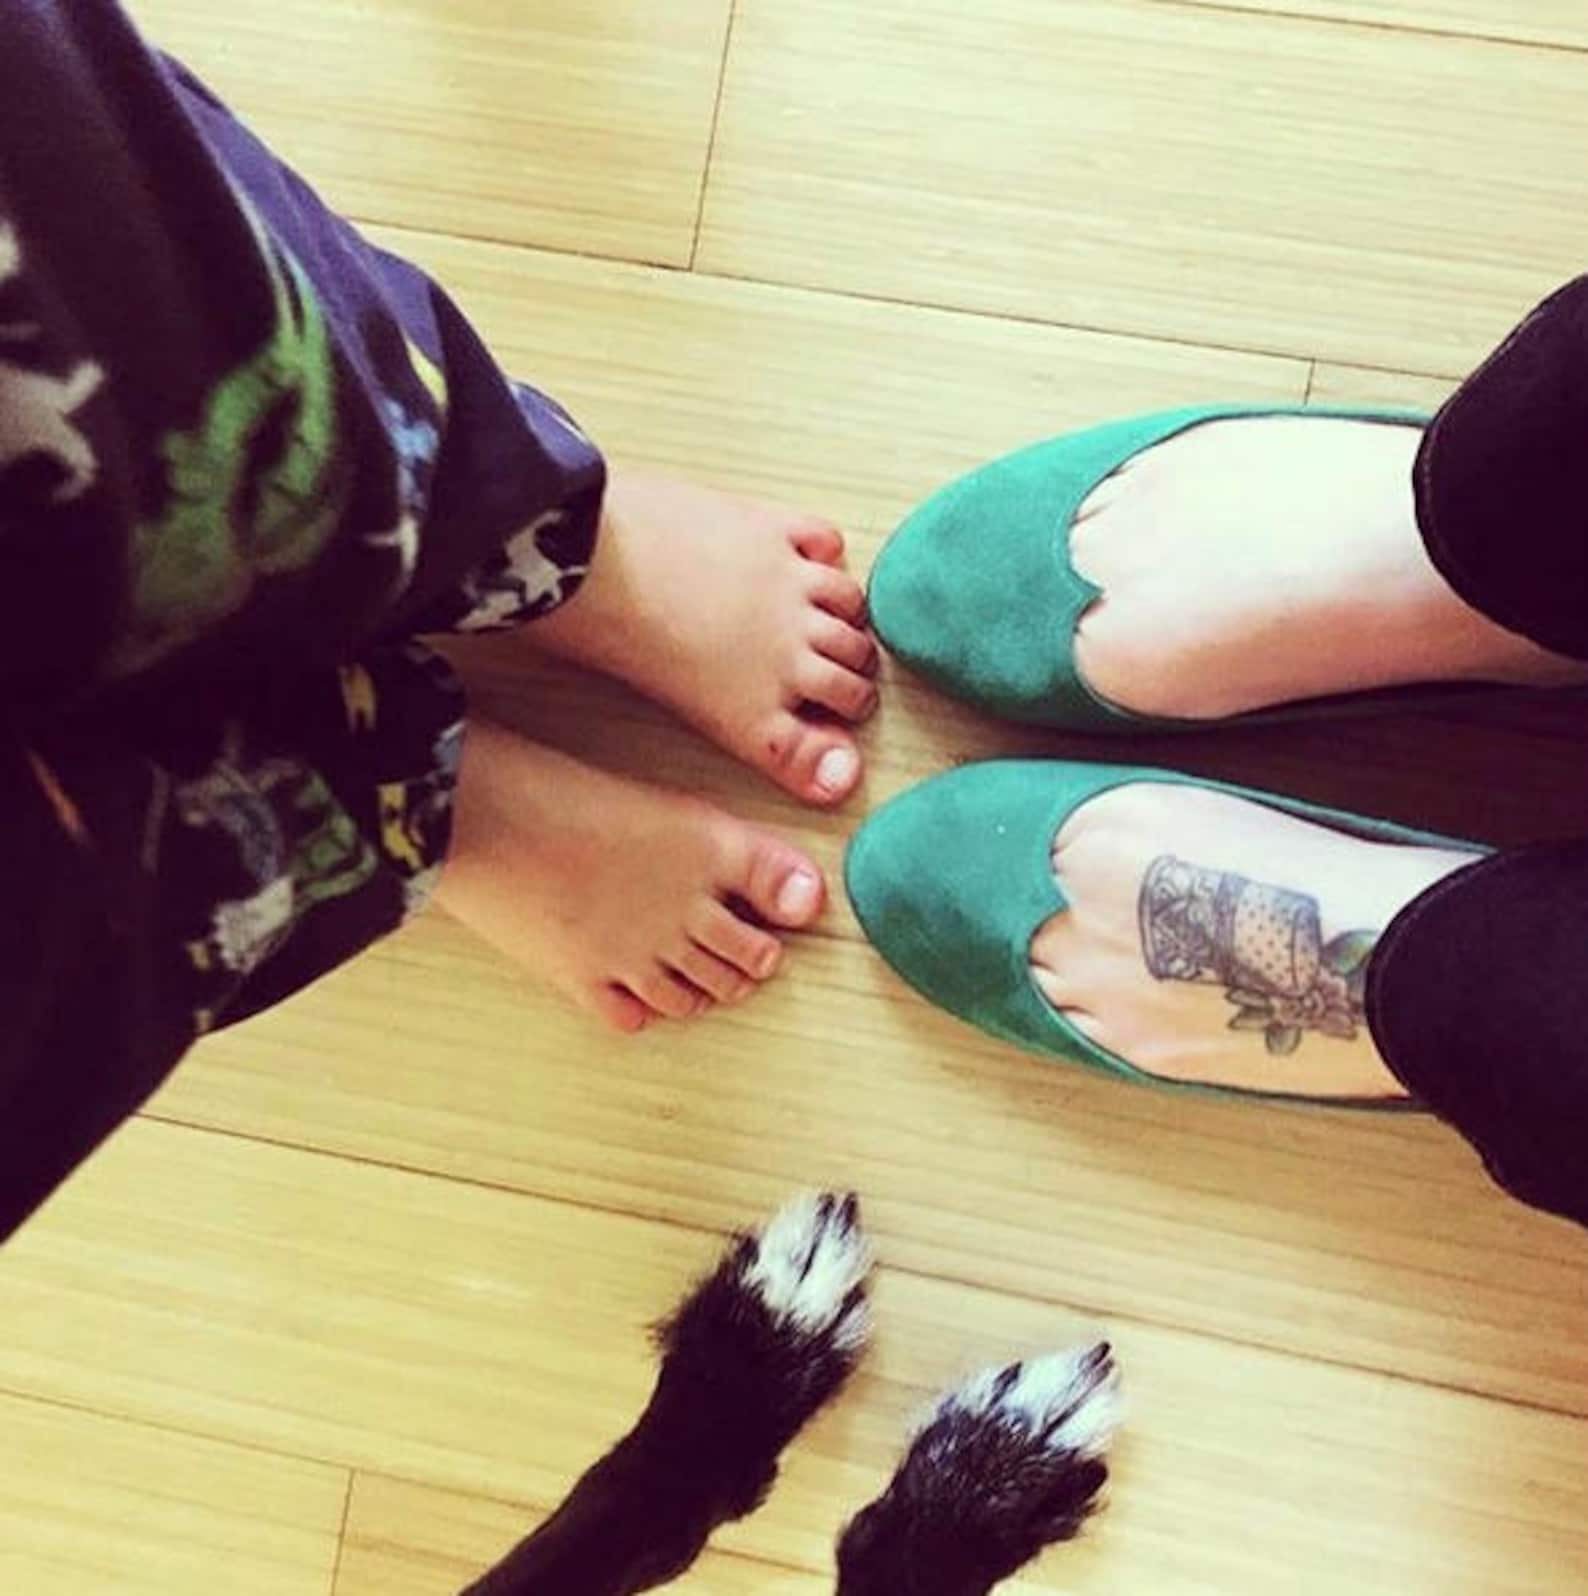 blue leather ballet flats. chaussure mariee. something blue wedding. cobalt blue shoes. royal wedding shoes. bridal shoes. eleha